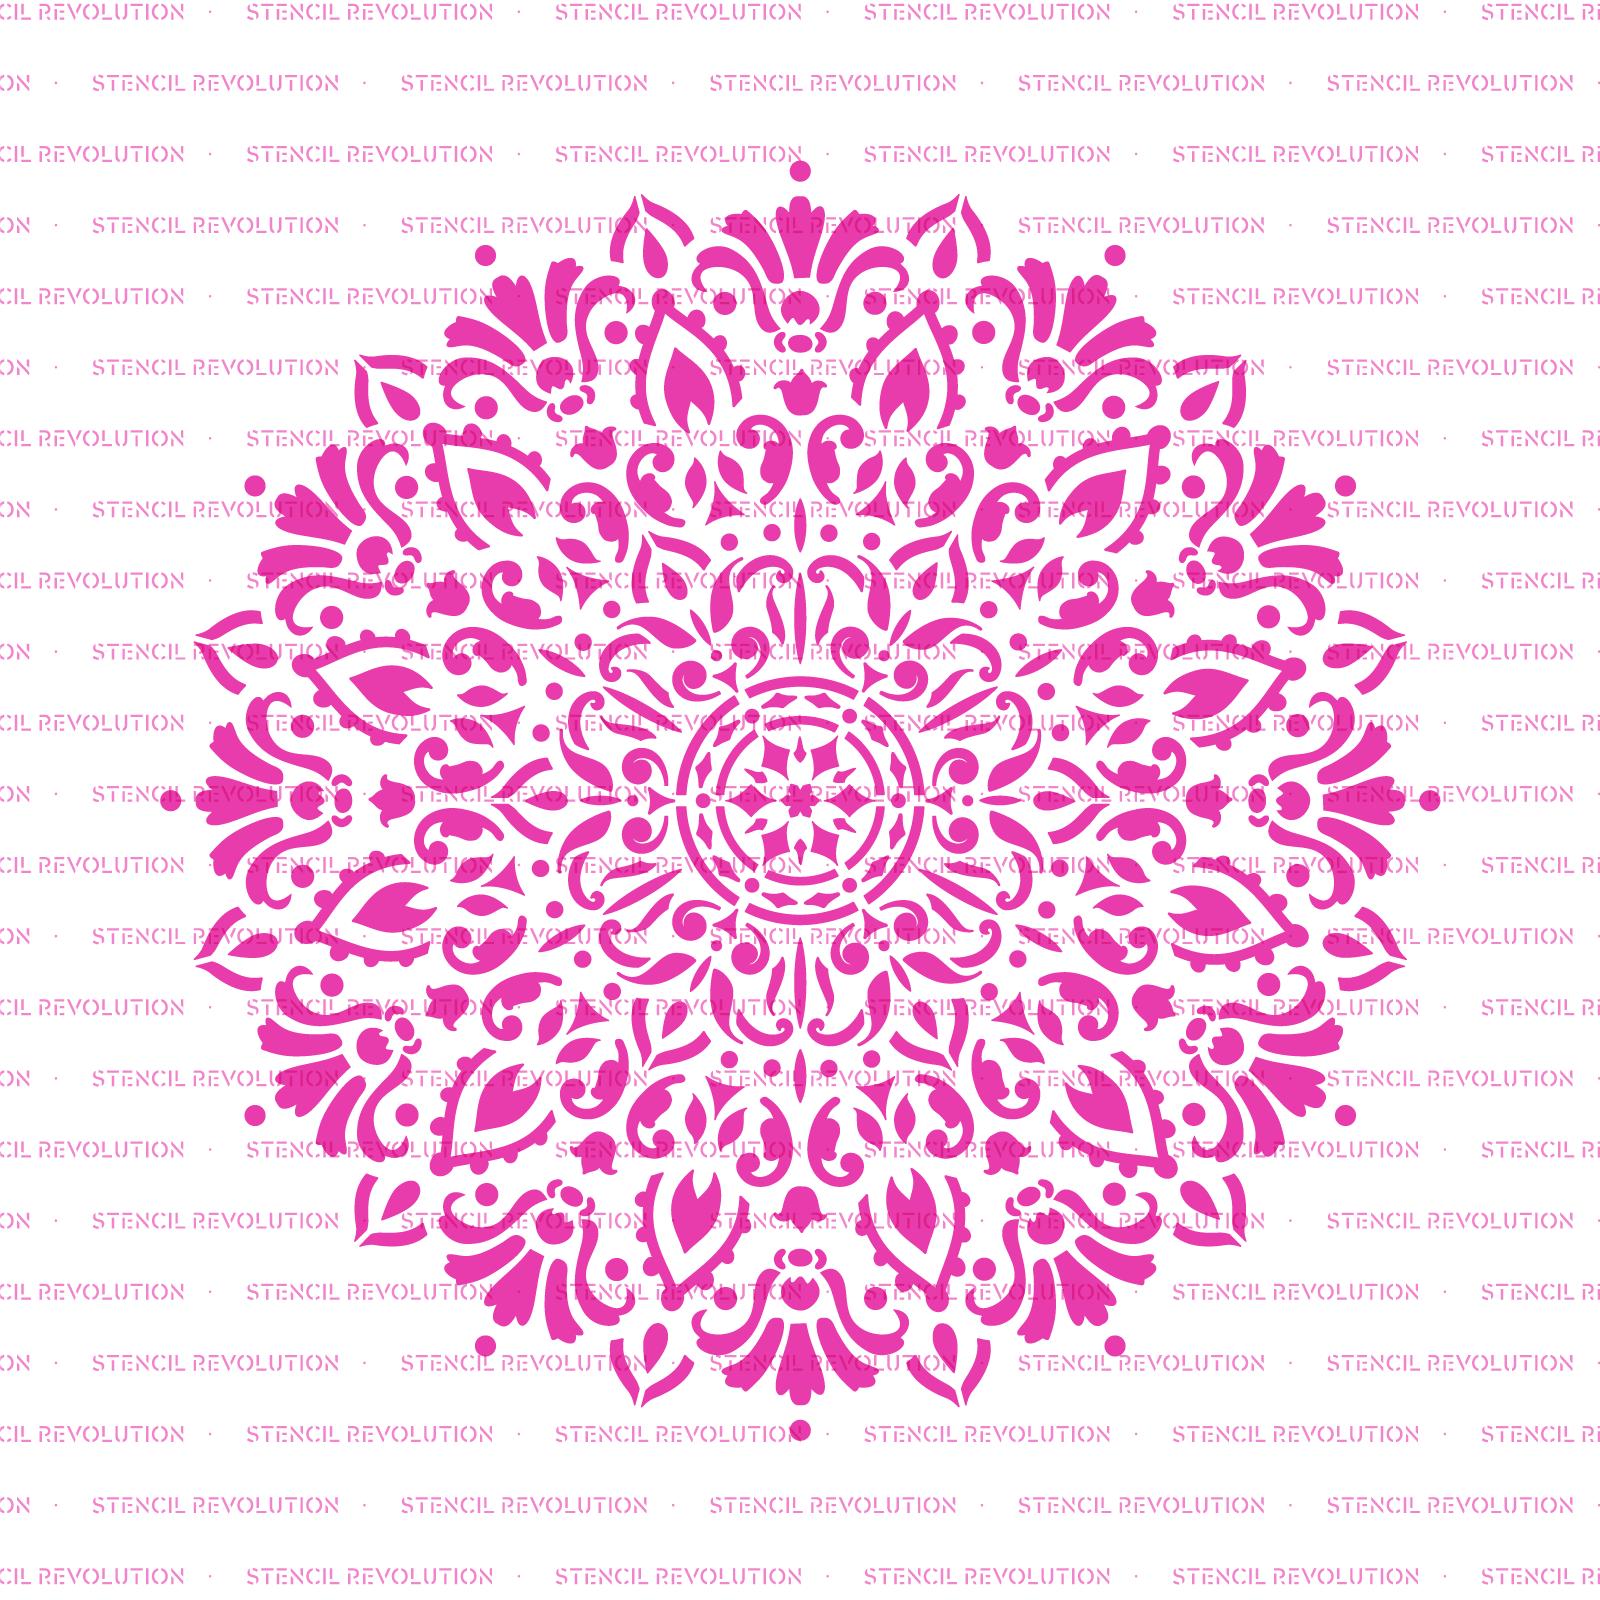 Harmony Mandala Stencil - Reusable Stencils of Harmony Mandala in Multiple Sizes